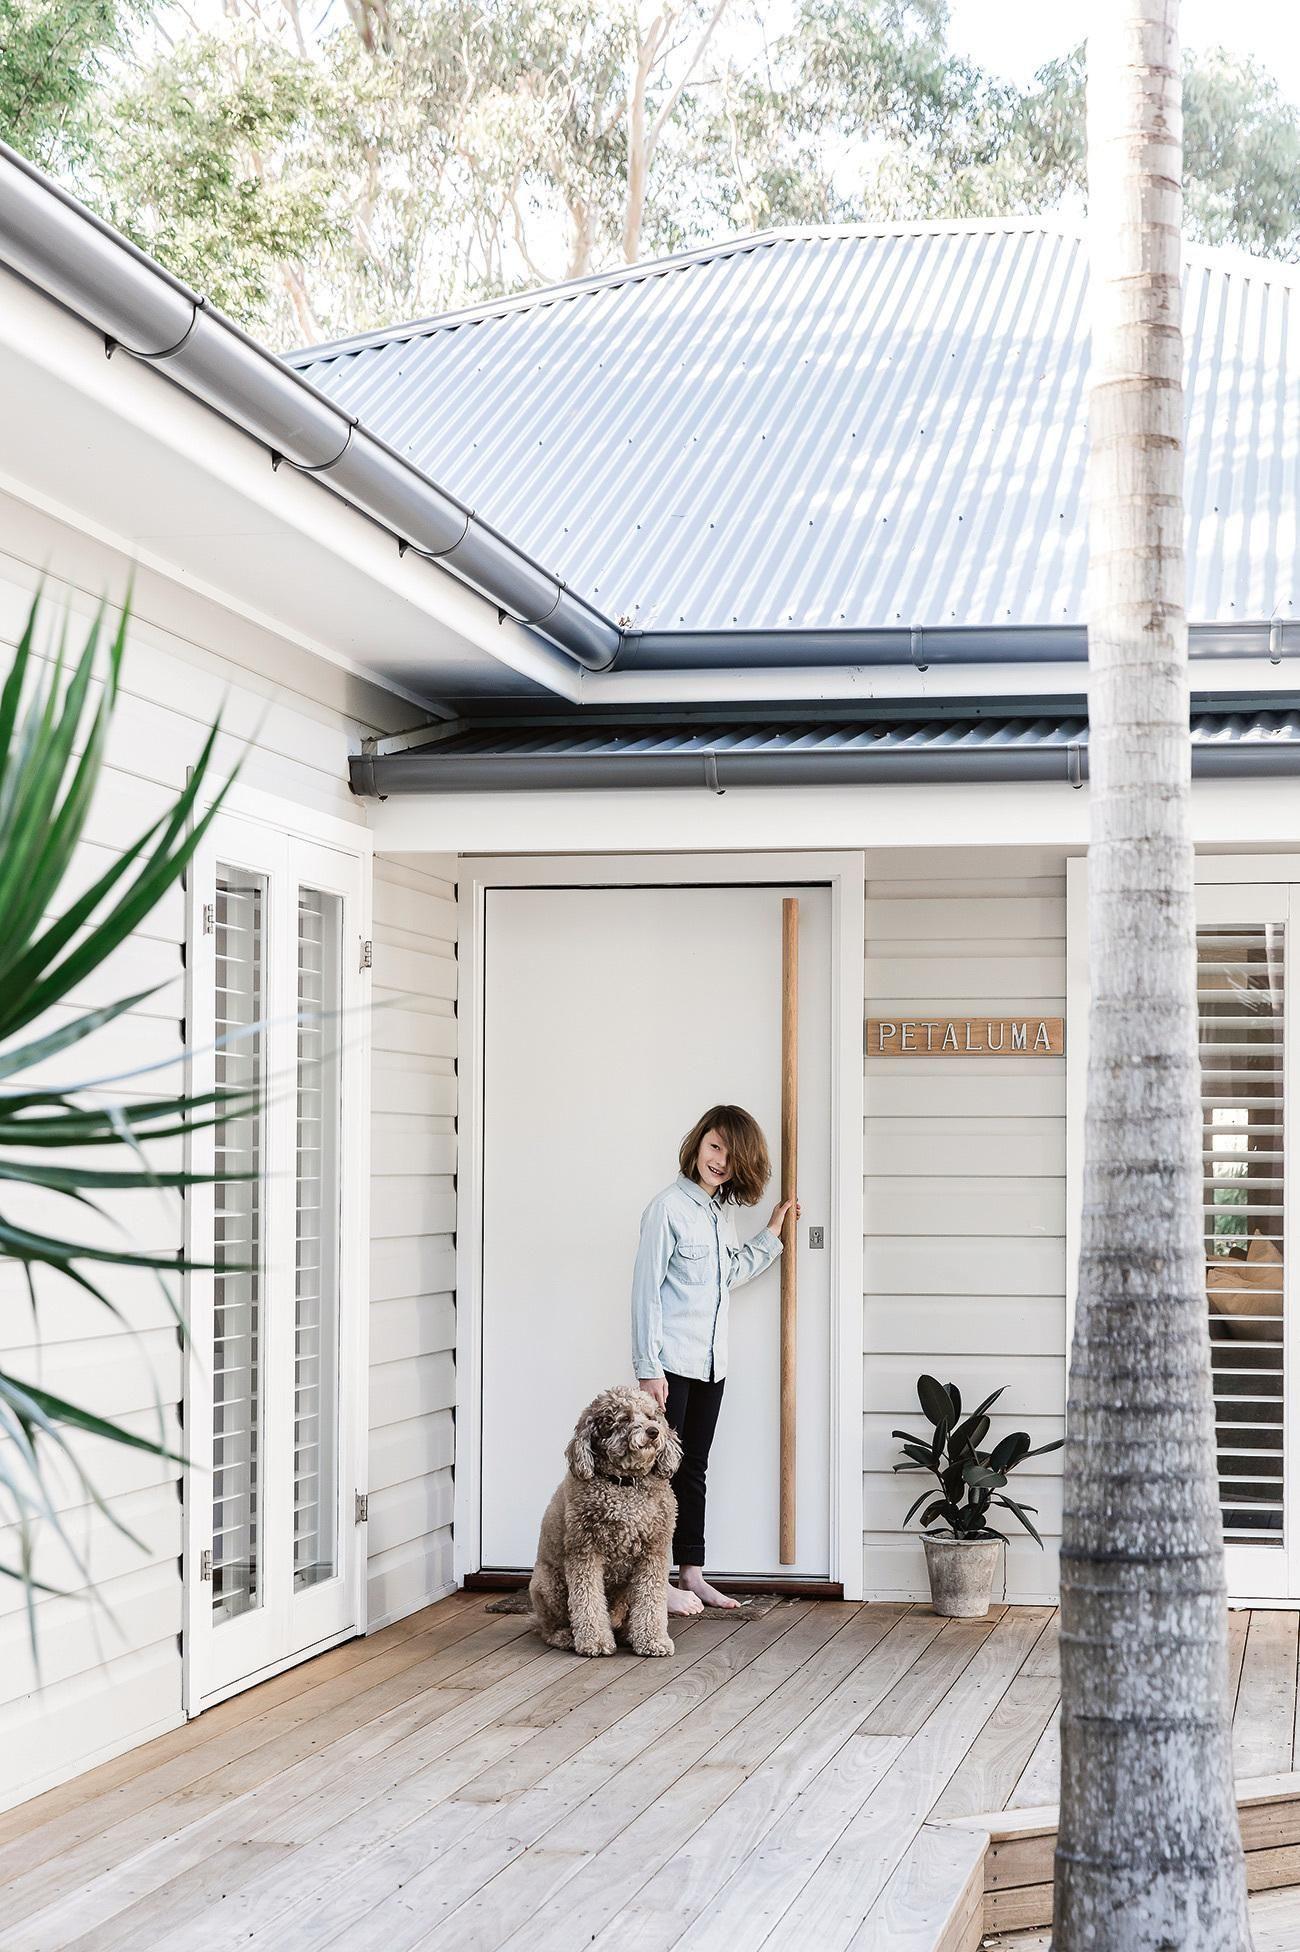 Australian Beach House Dreams Australianbeaches With Images